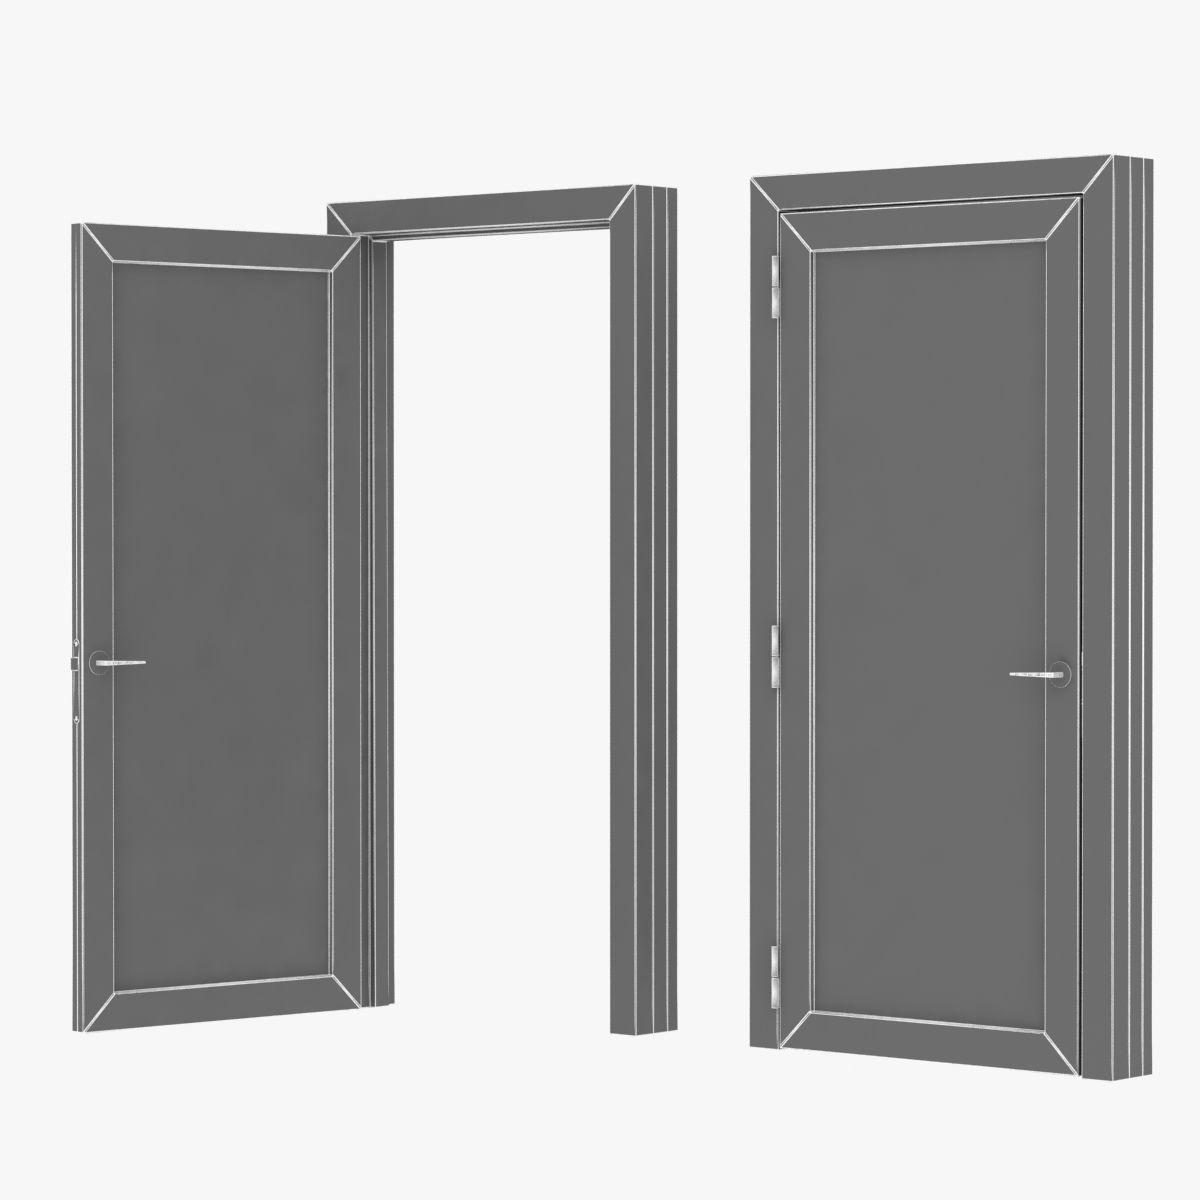 Open And Closed Doors : Door open reaction the quot sc st giphy